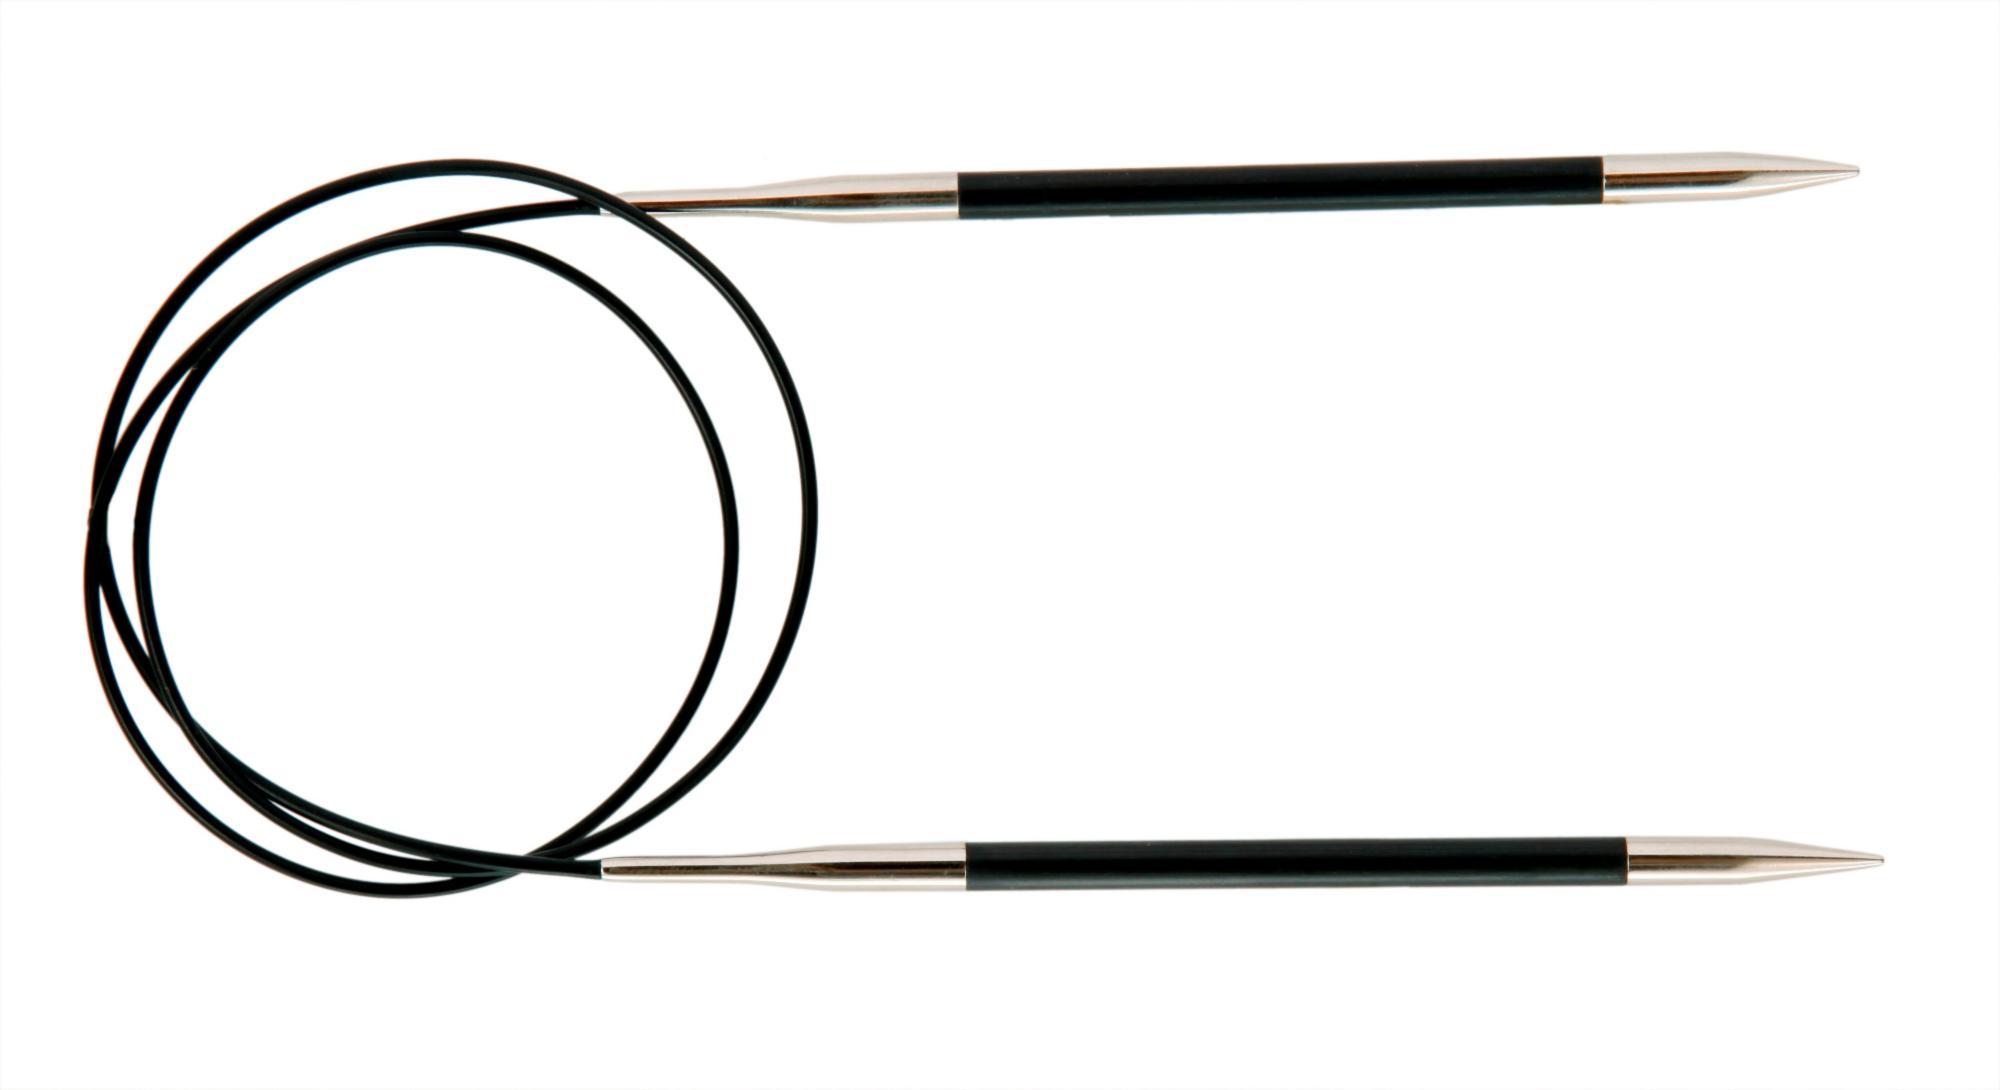 Спицы круговые 100 см Karbonz KnitPro, 41209, 4.00 мм